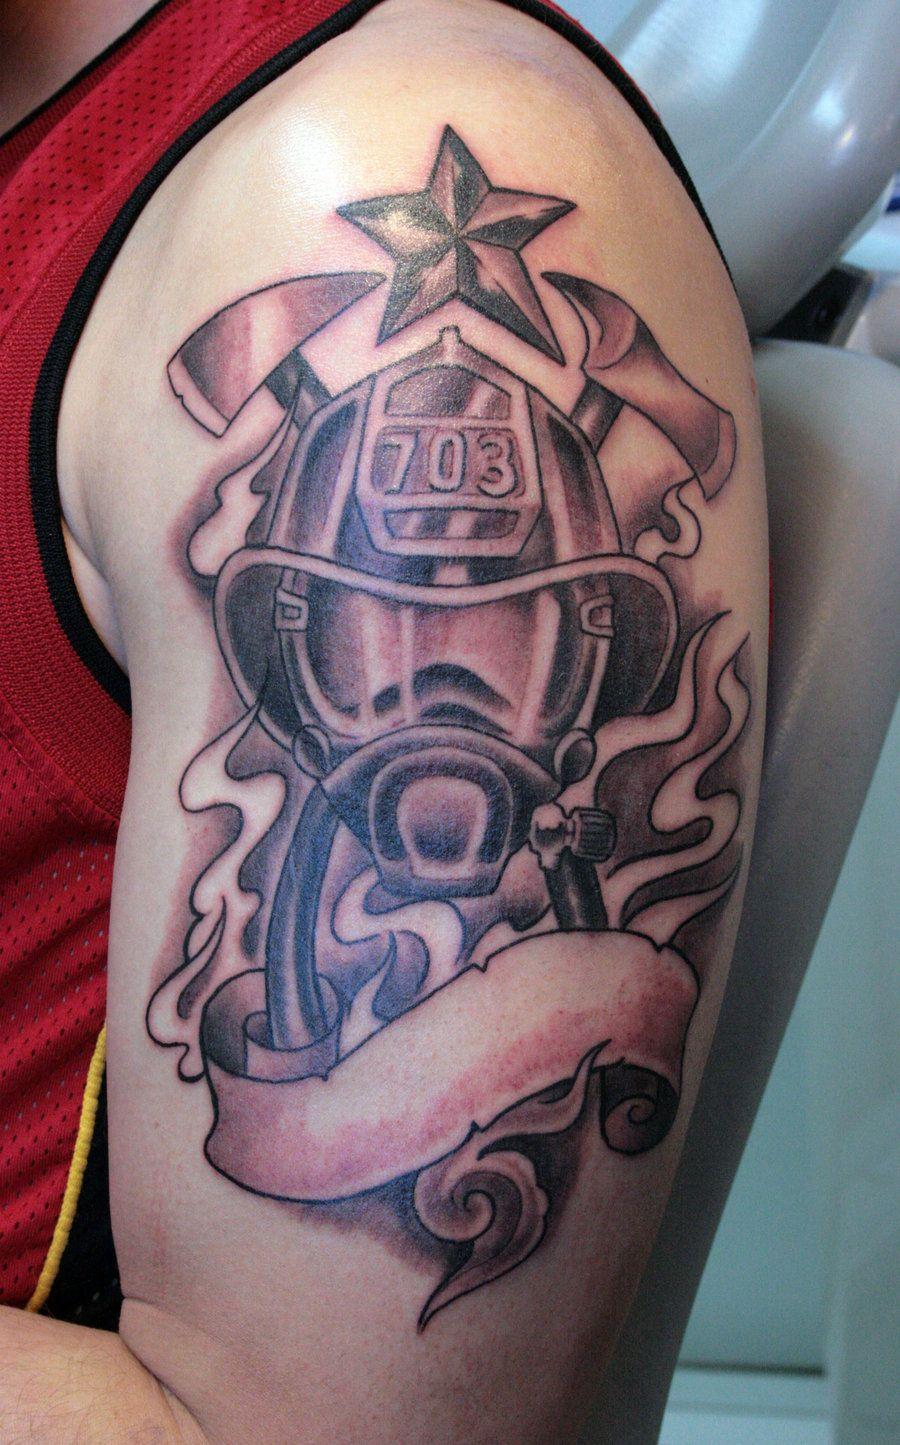 Firefighterhelmettattoos Firefighter Helmet Tattoos Nice with regard to dimensions 900 X 1445